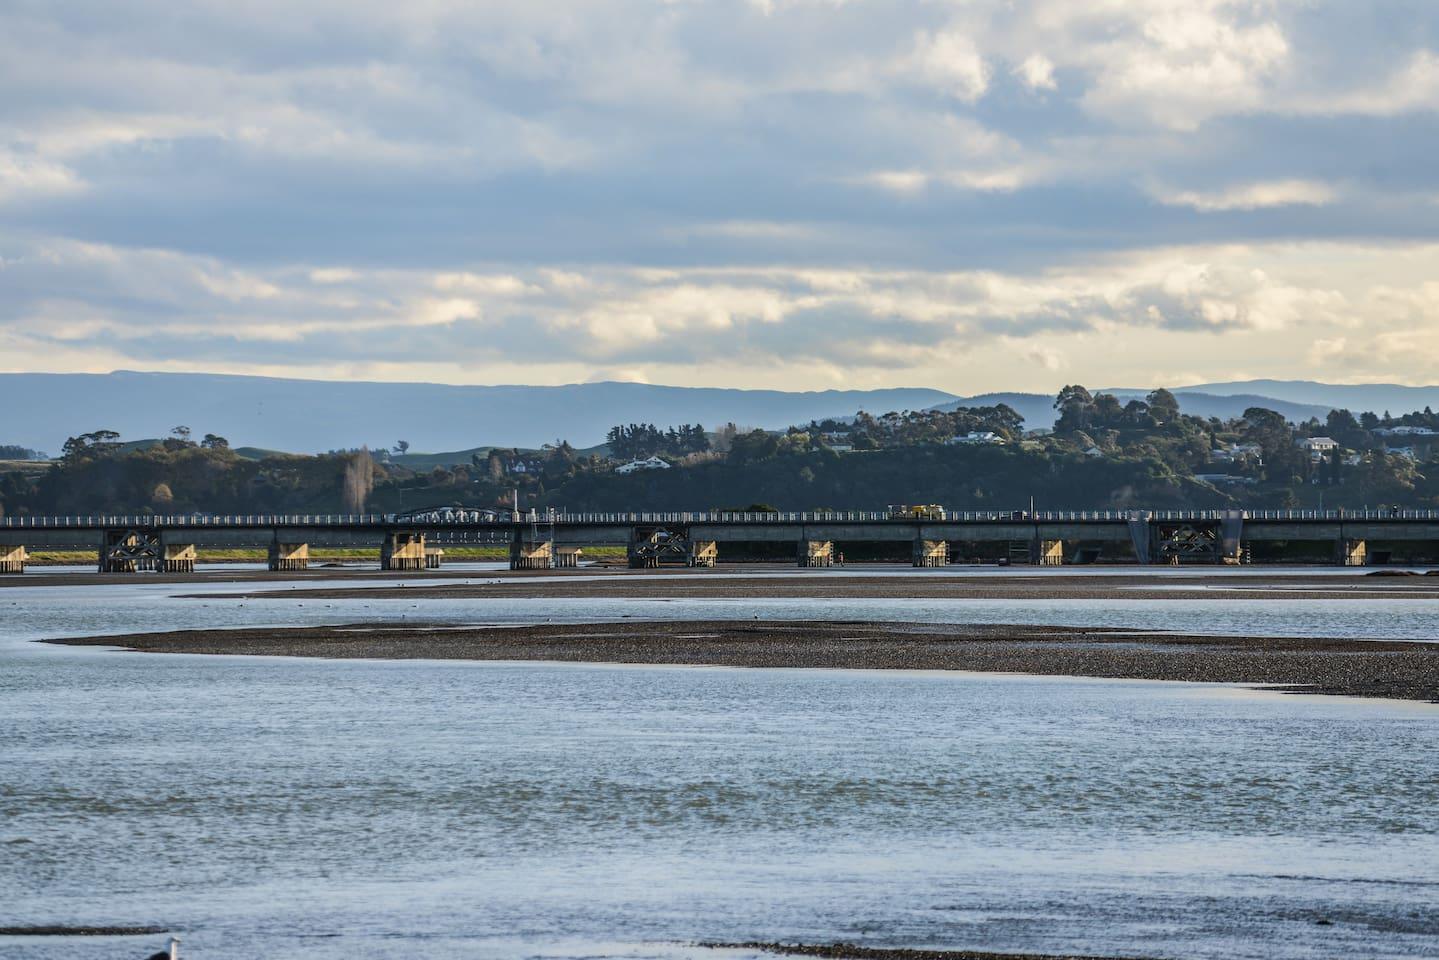 Estuary bridge opposite Uiskentui